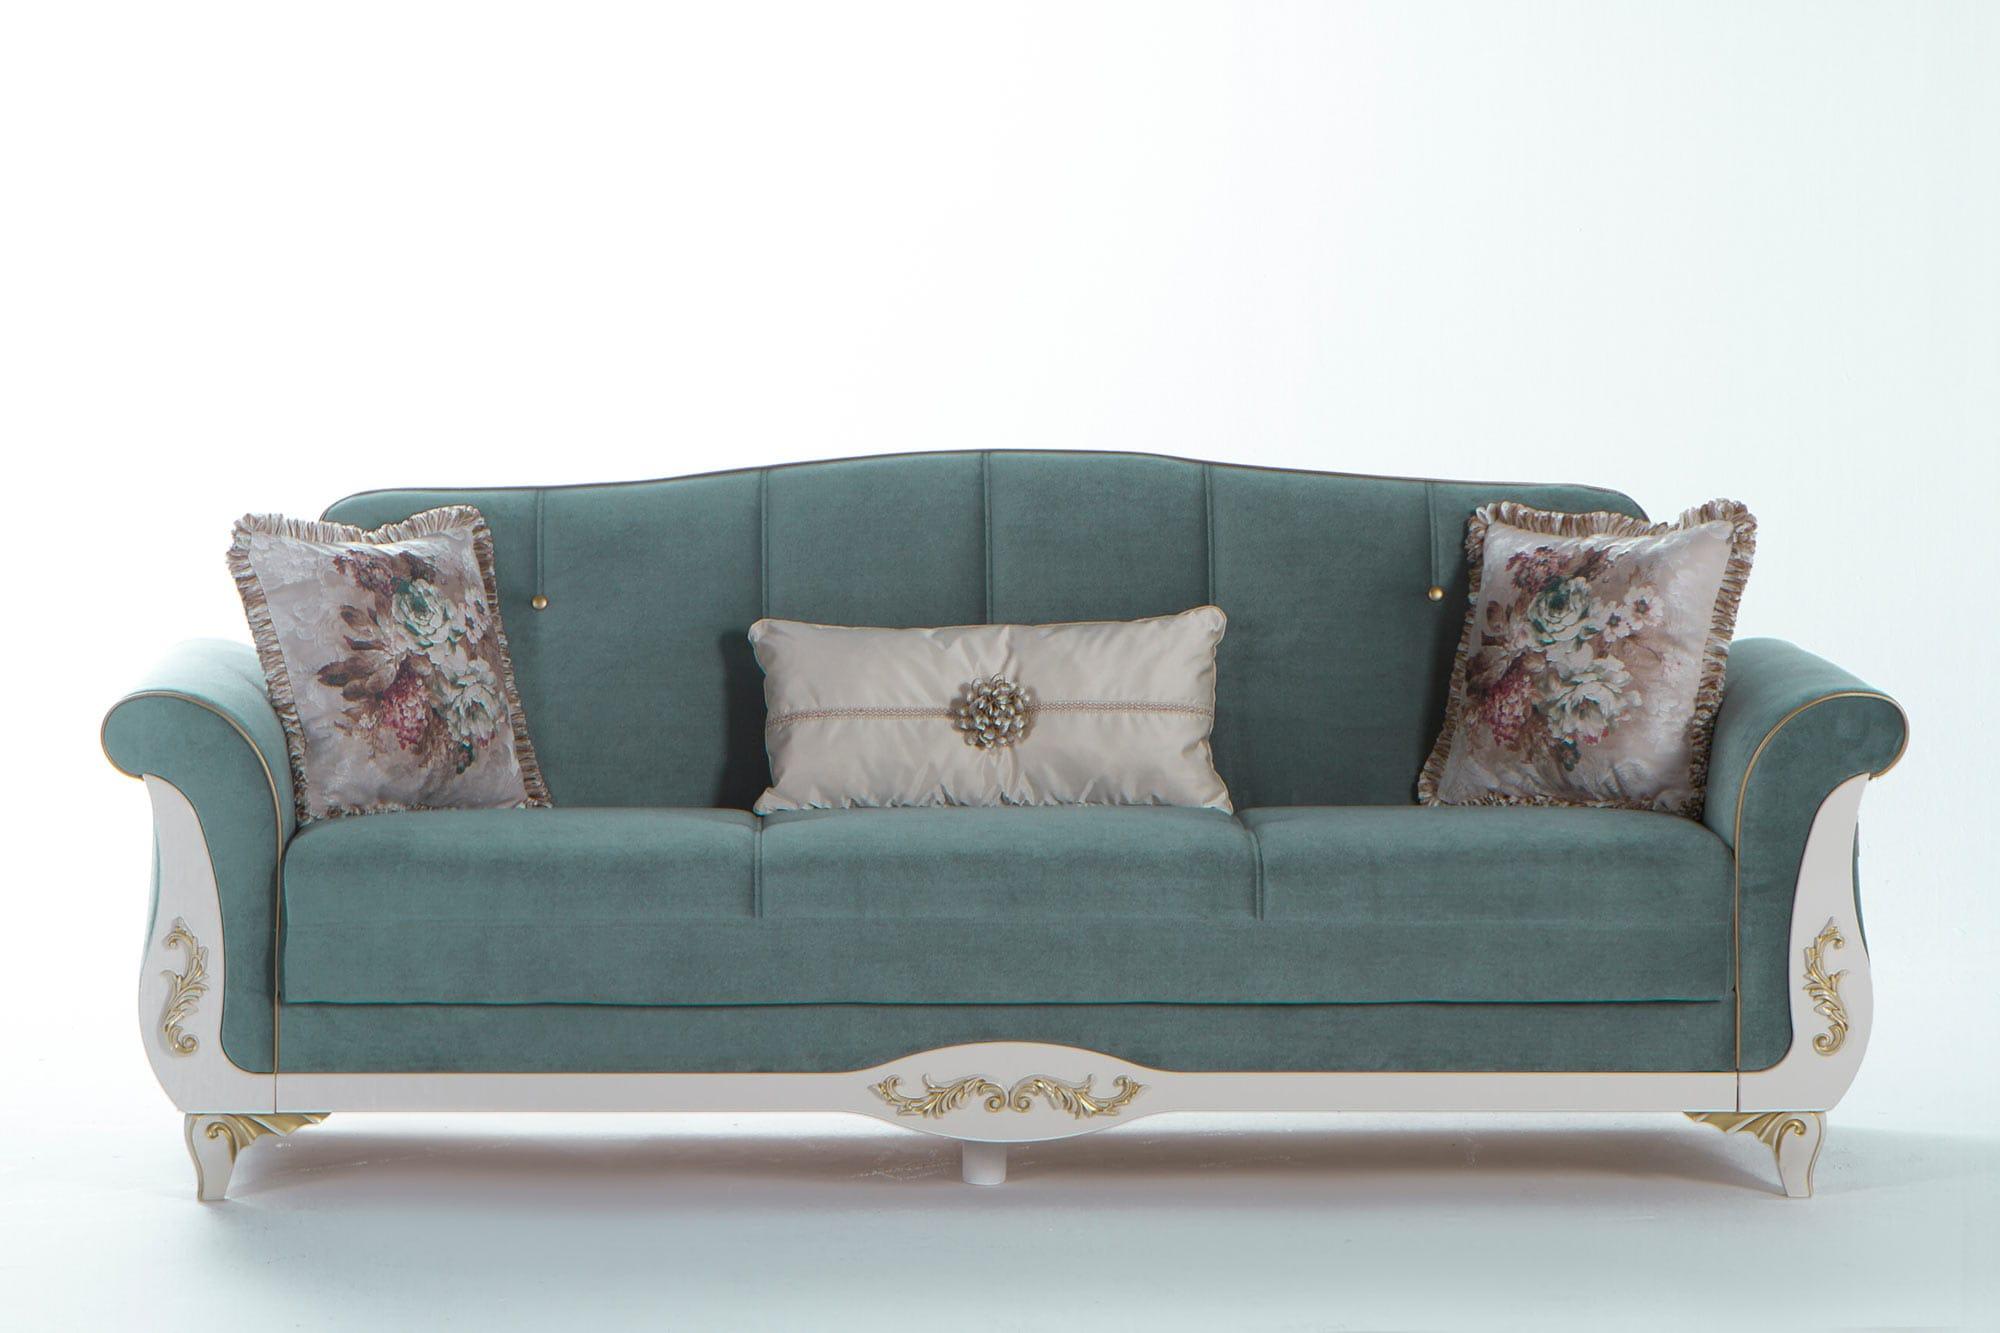 Phenomenal Astoria Caprice Seafoam Green Convertible Sofa Bed By Istikbal Furniture Cjindustries Chair Design For Home Cjindustriesco